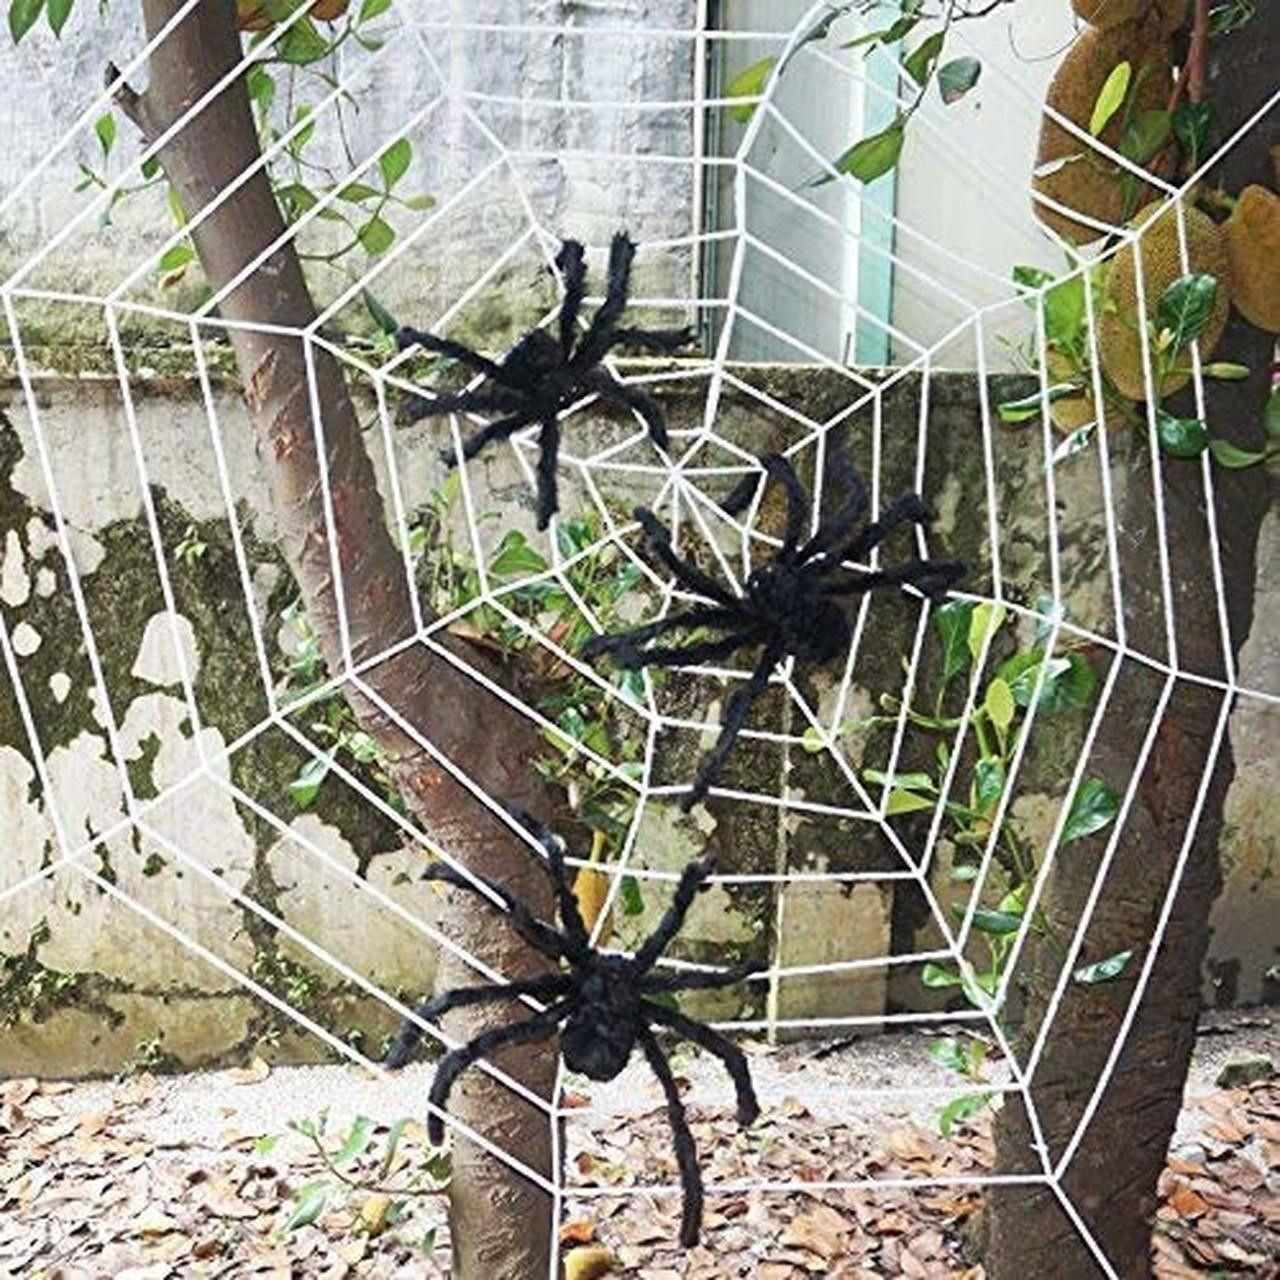 Cheap Large Halloween Decorations Large Cardboard Halloween Decorations Extra Large Ha Halloween Spider Web Fun Halloween Decor Halloween Outdoor Decorations